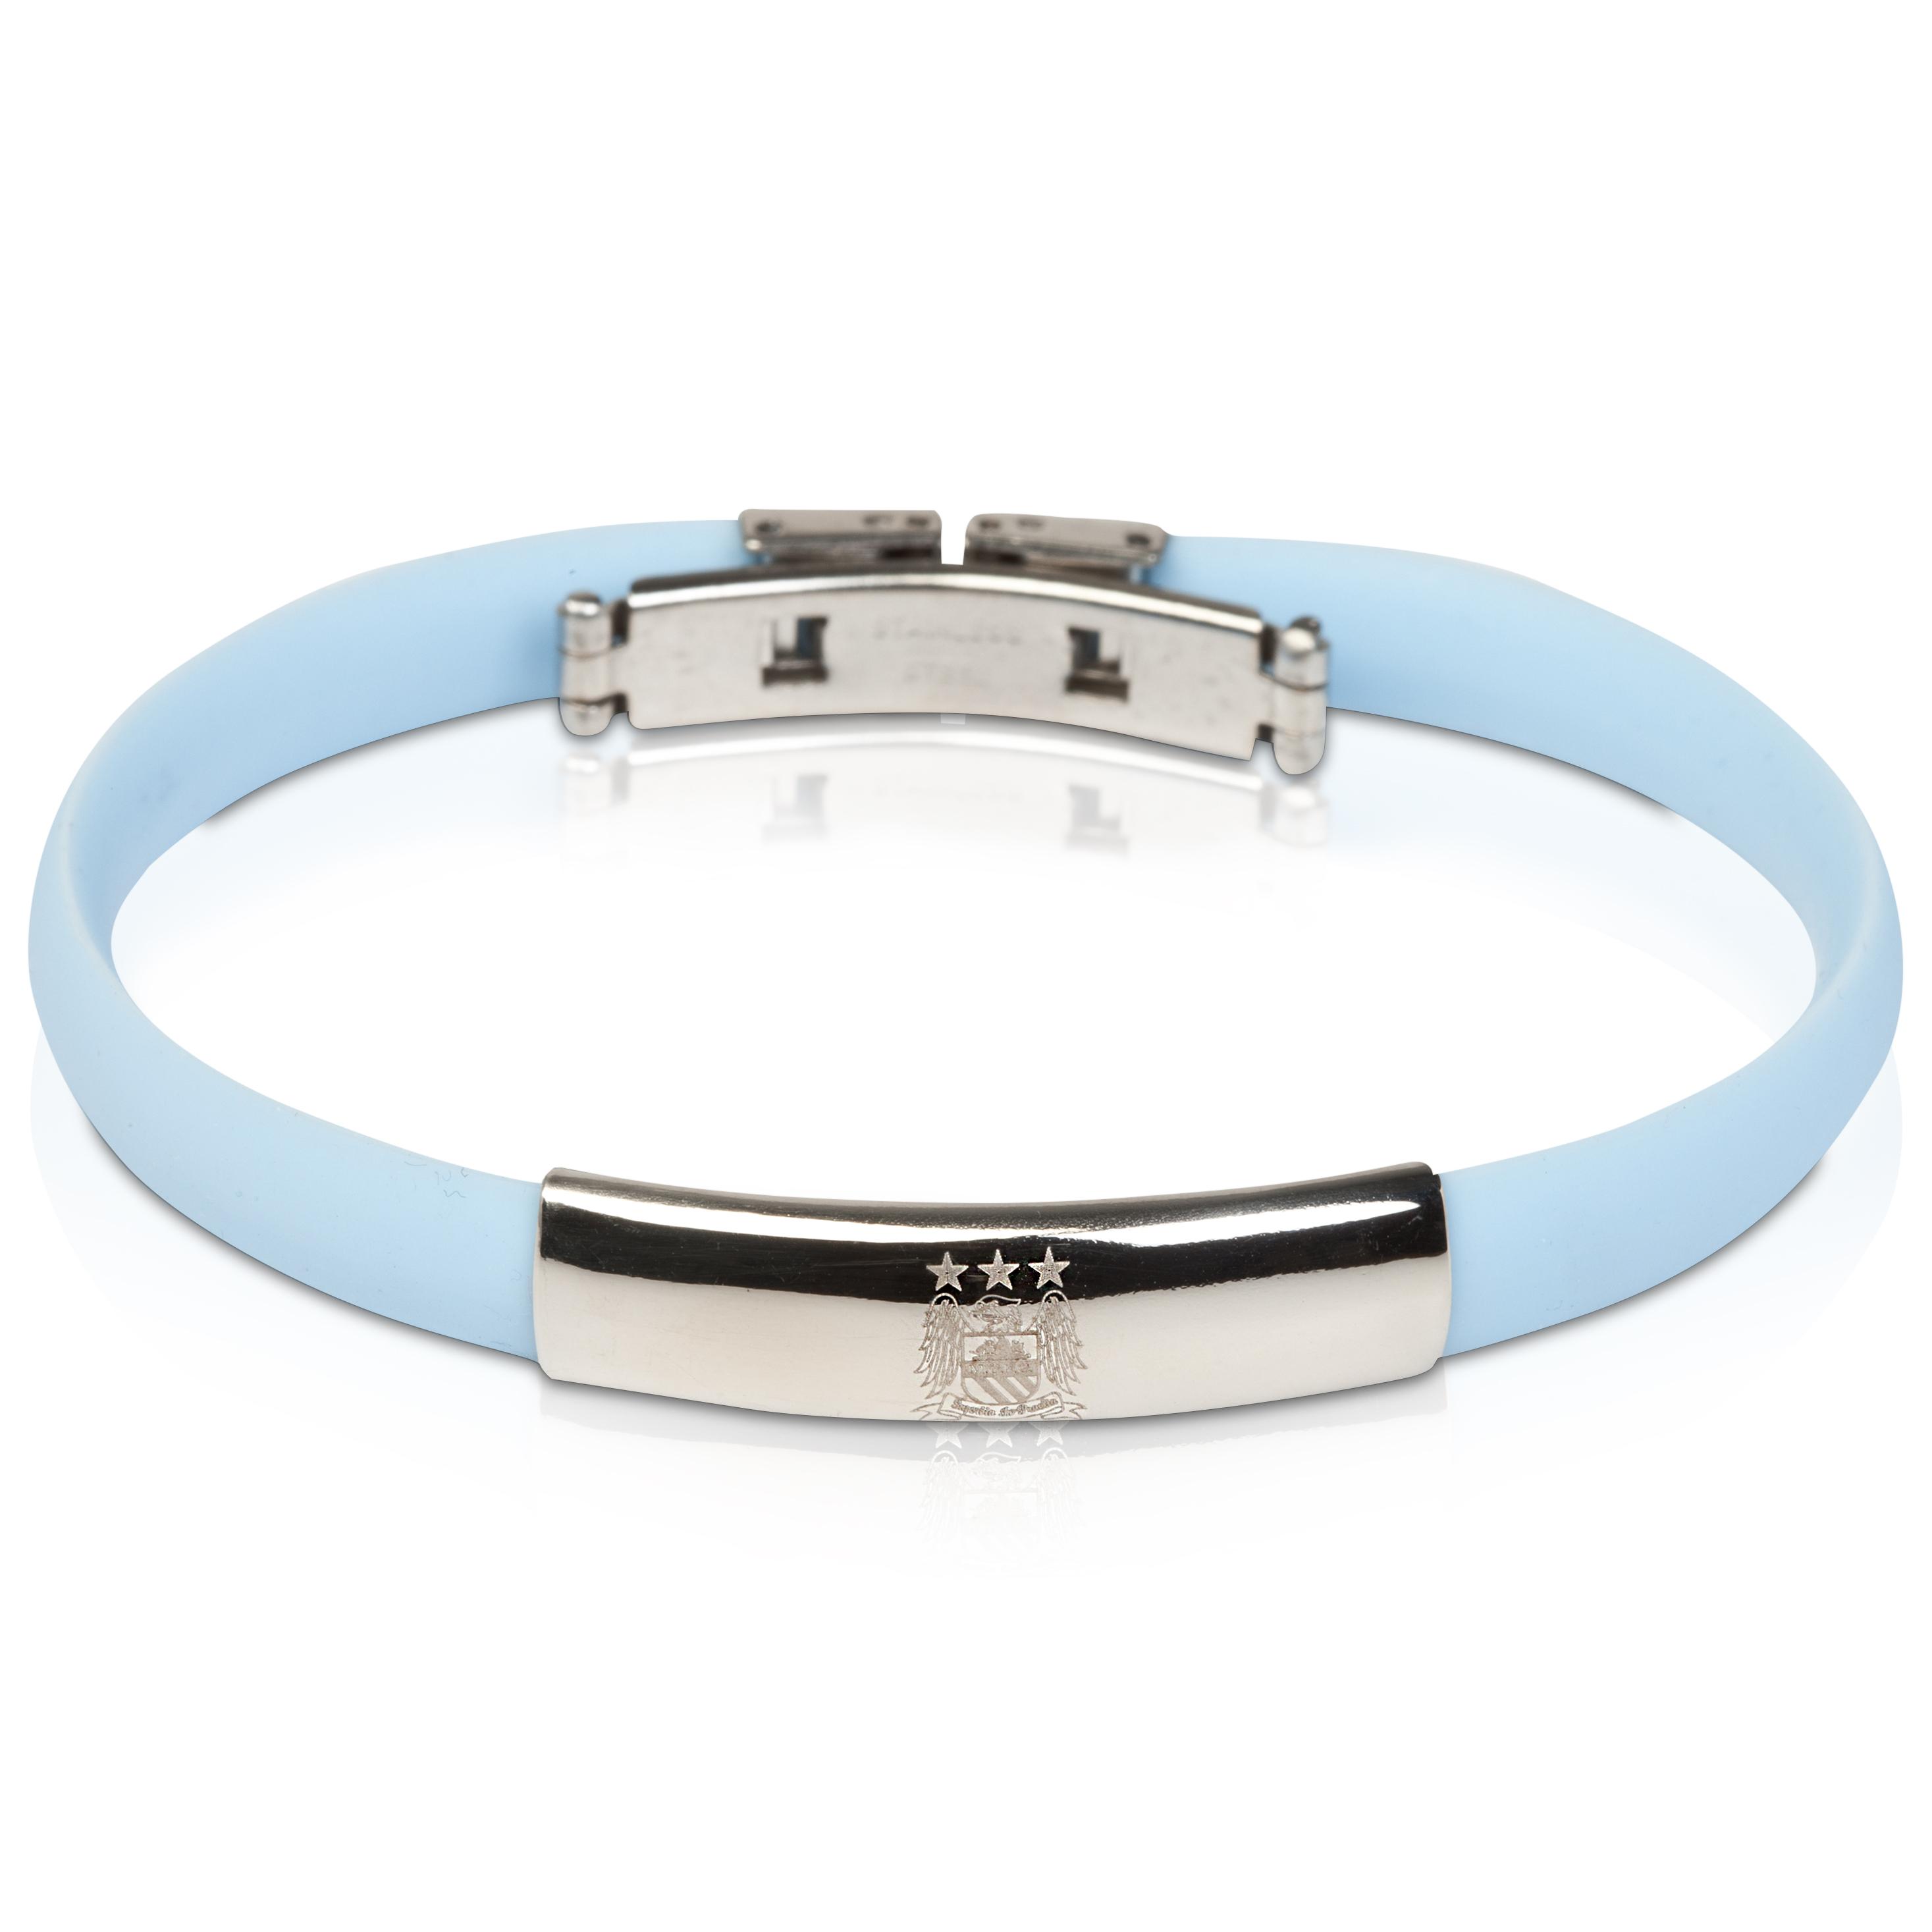 Manchester City Rubber Crest SS Bracelet